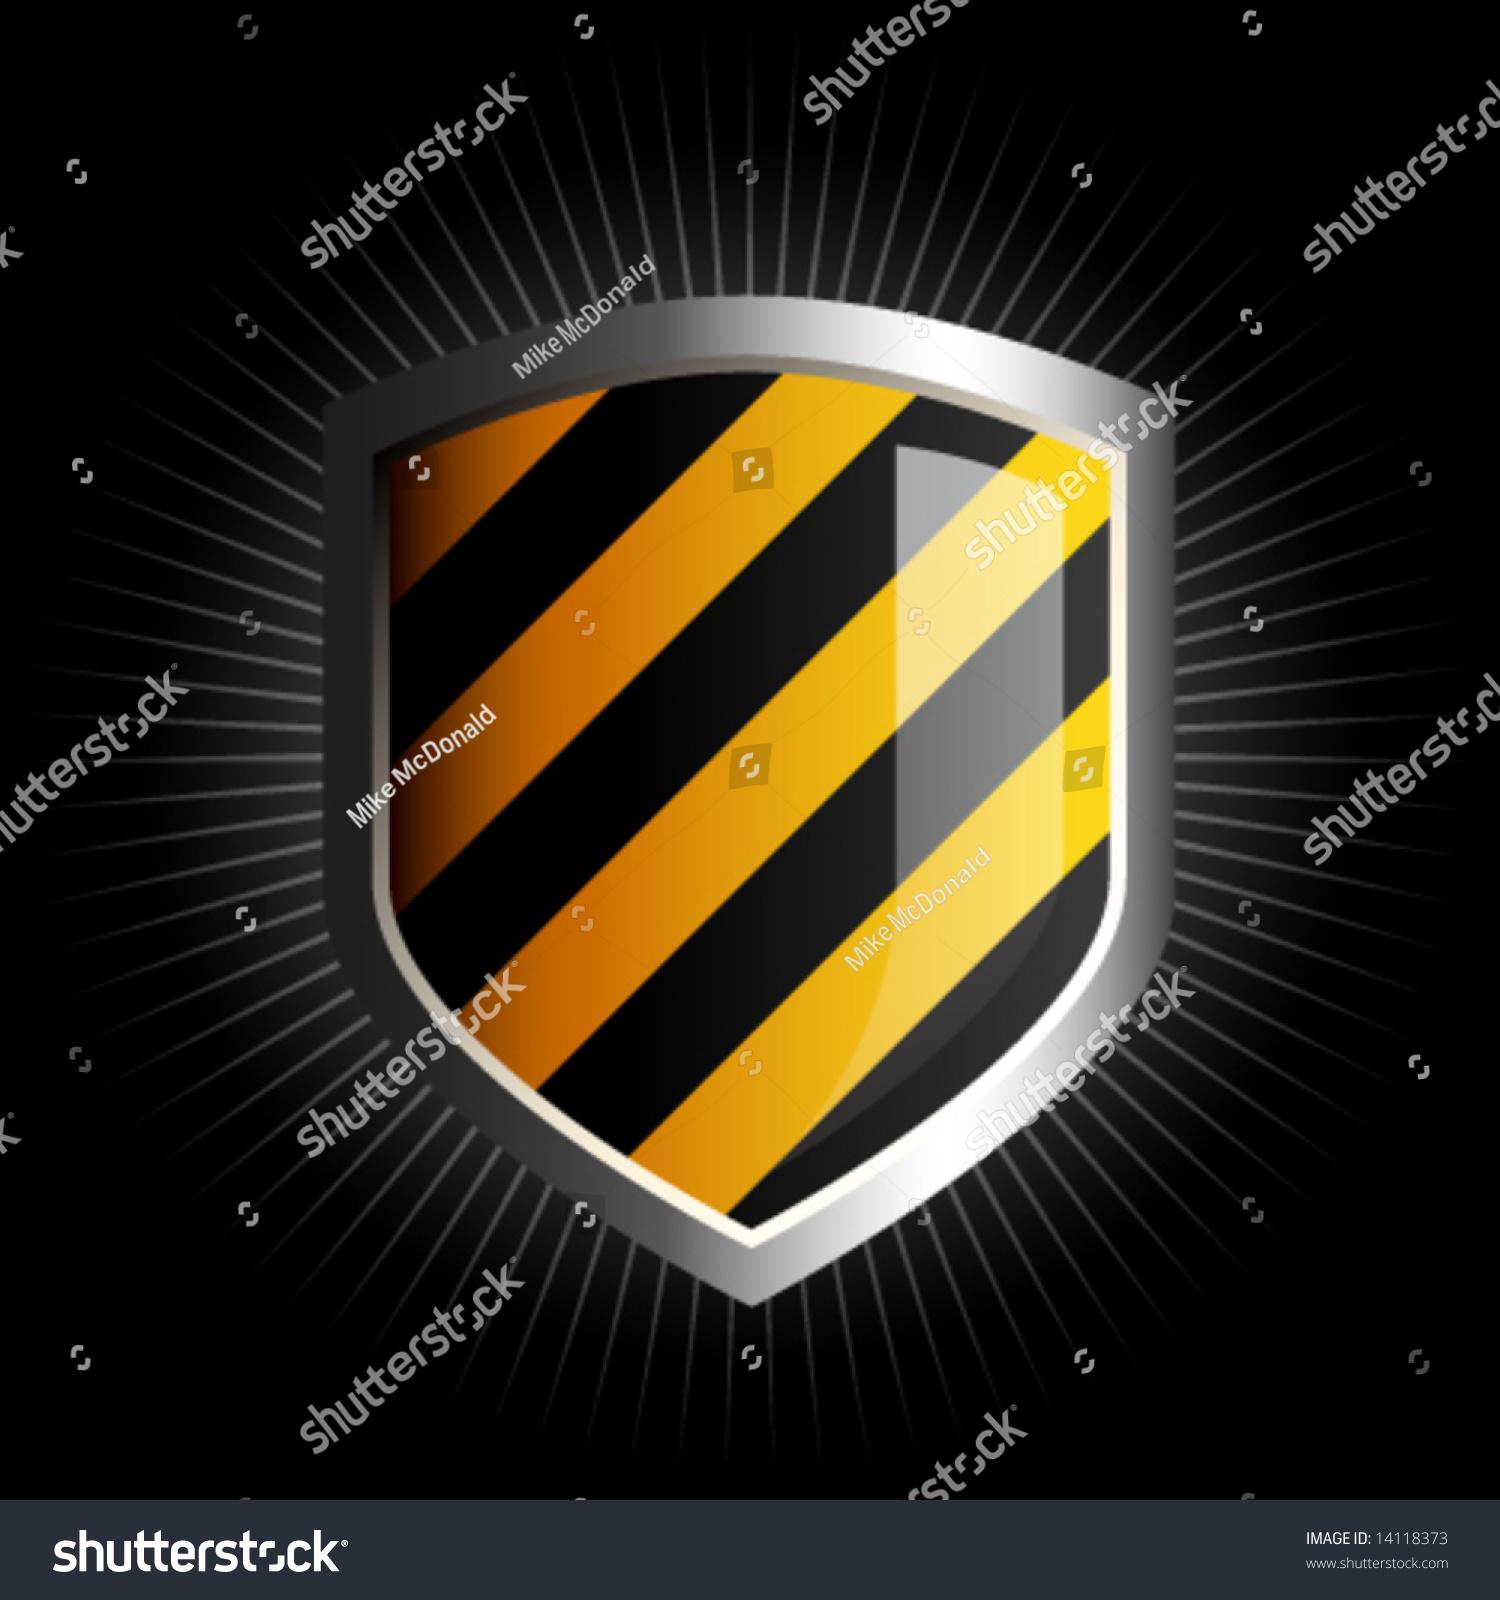 Black And Blue Striped Emblem - Interracial-5495